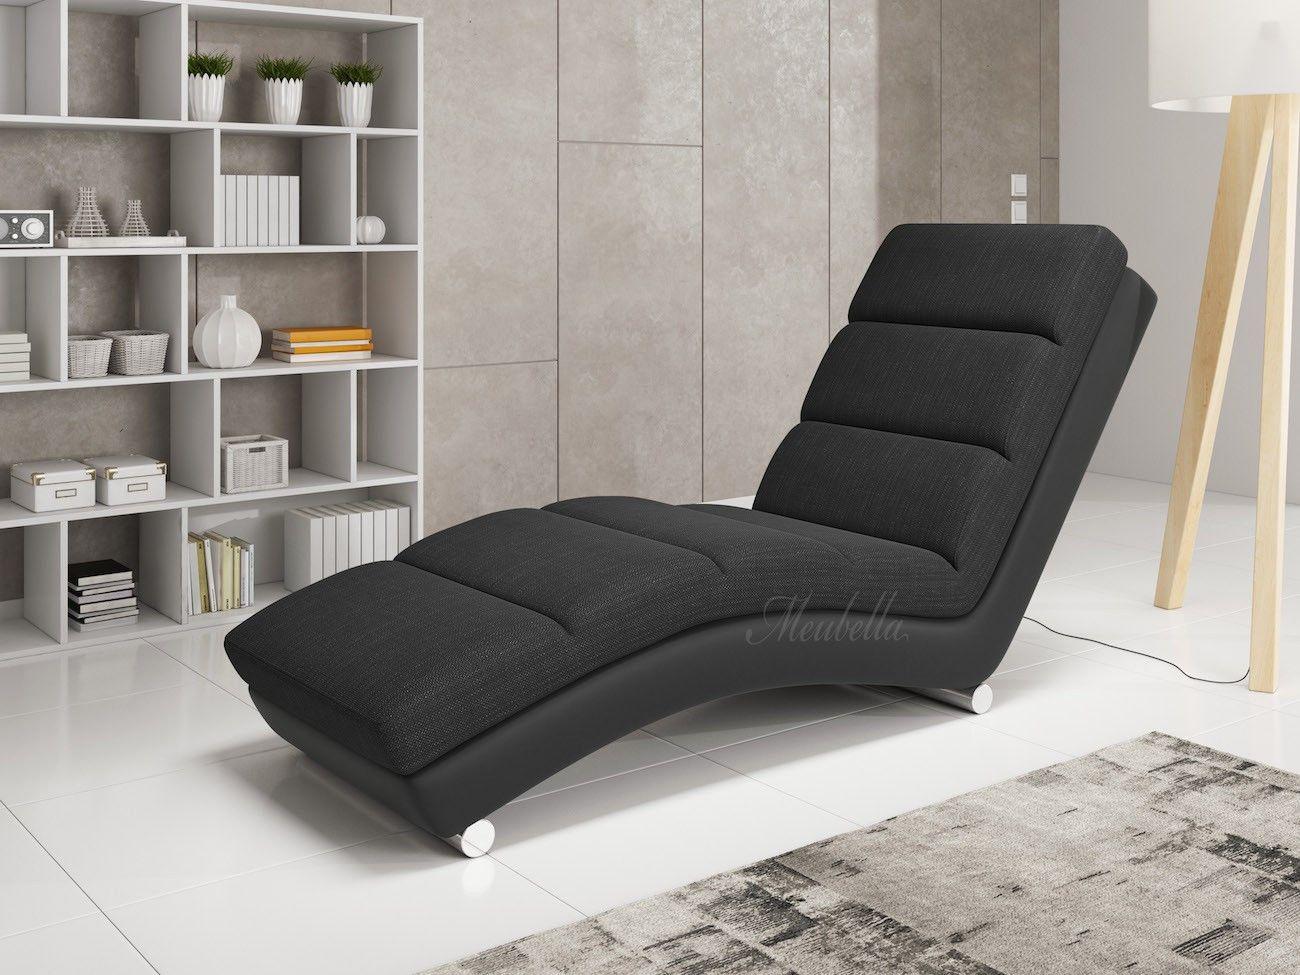 Chaise Longue Leer : Chaise longue ibiza zwart leer stof chaise longue